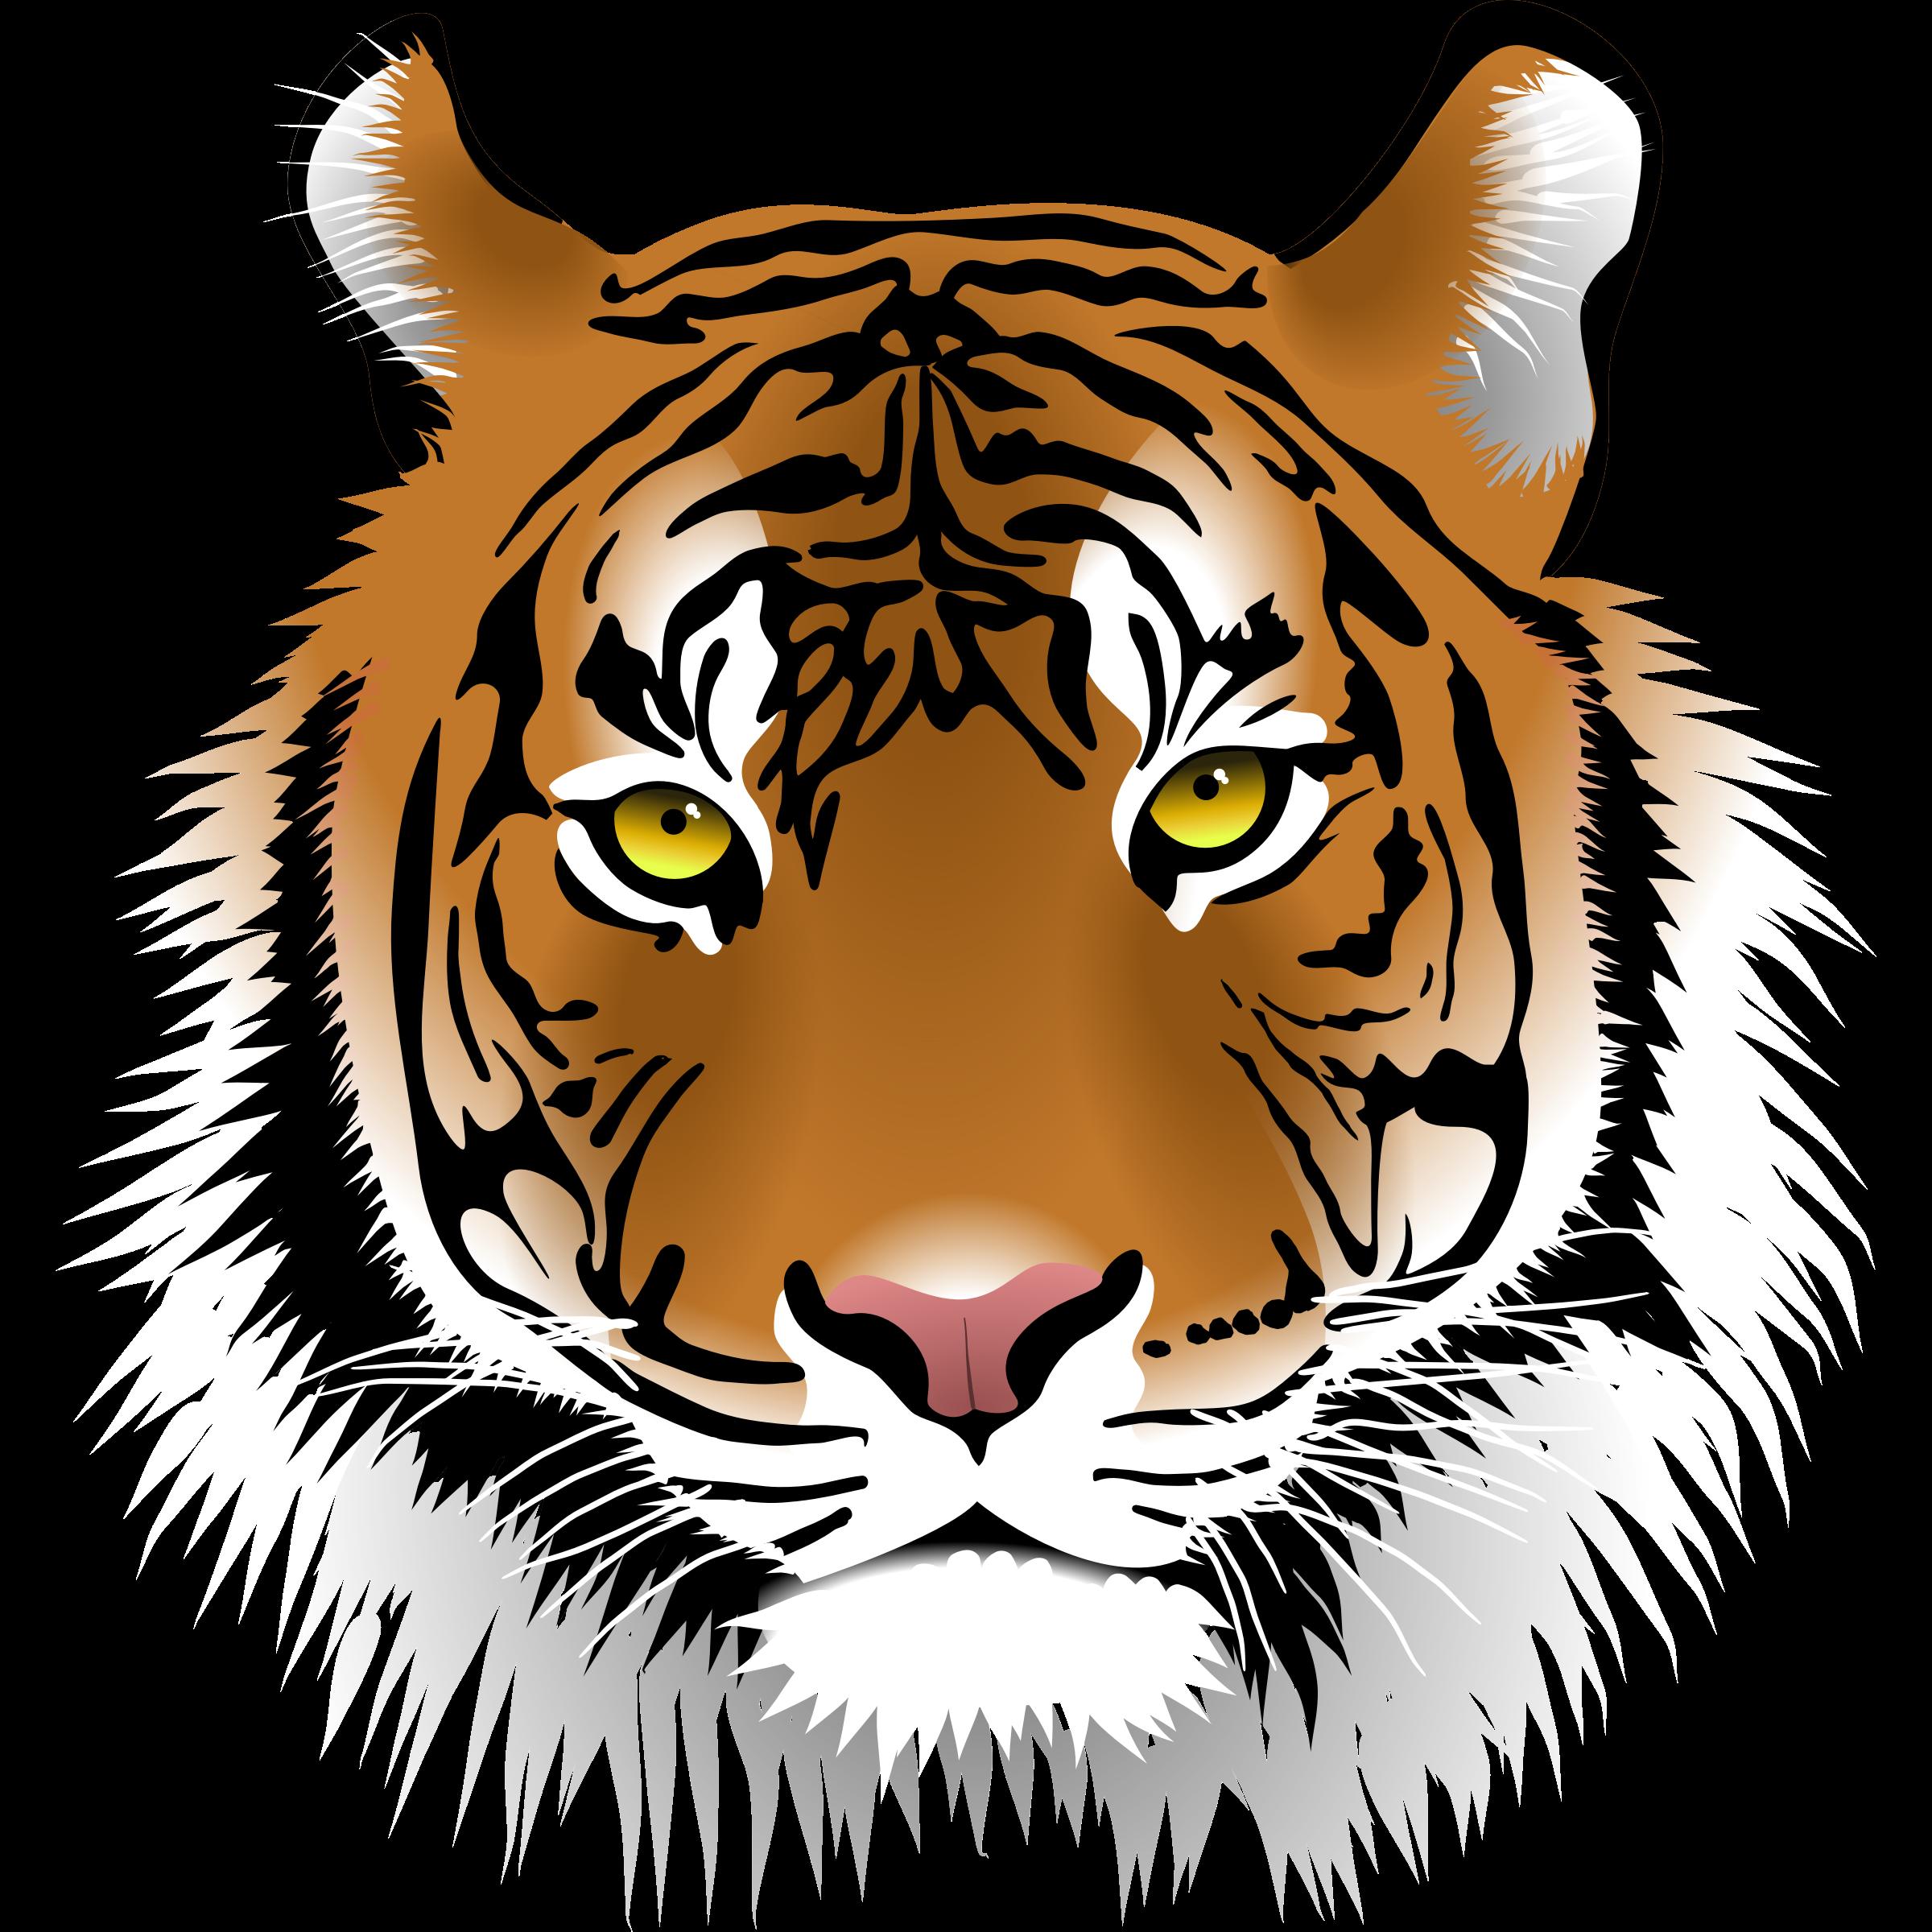 2400x2400 Tiger clipart tiger image